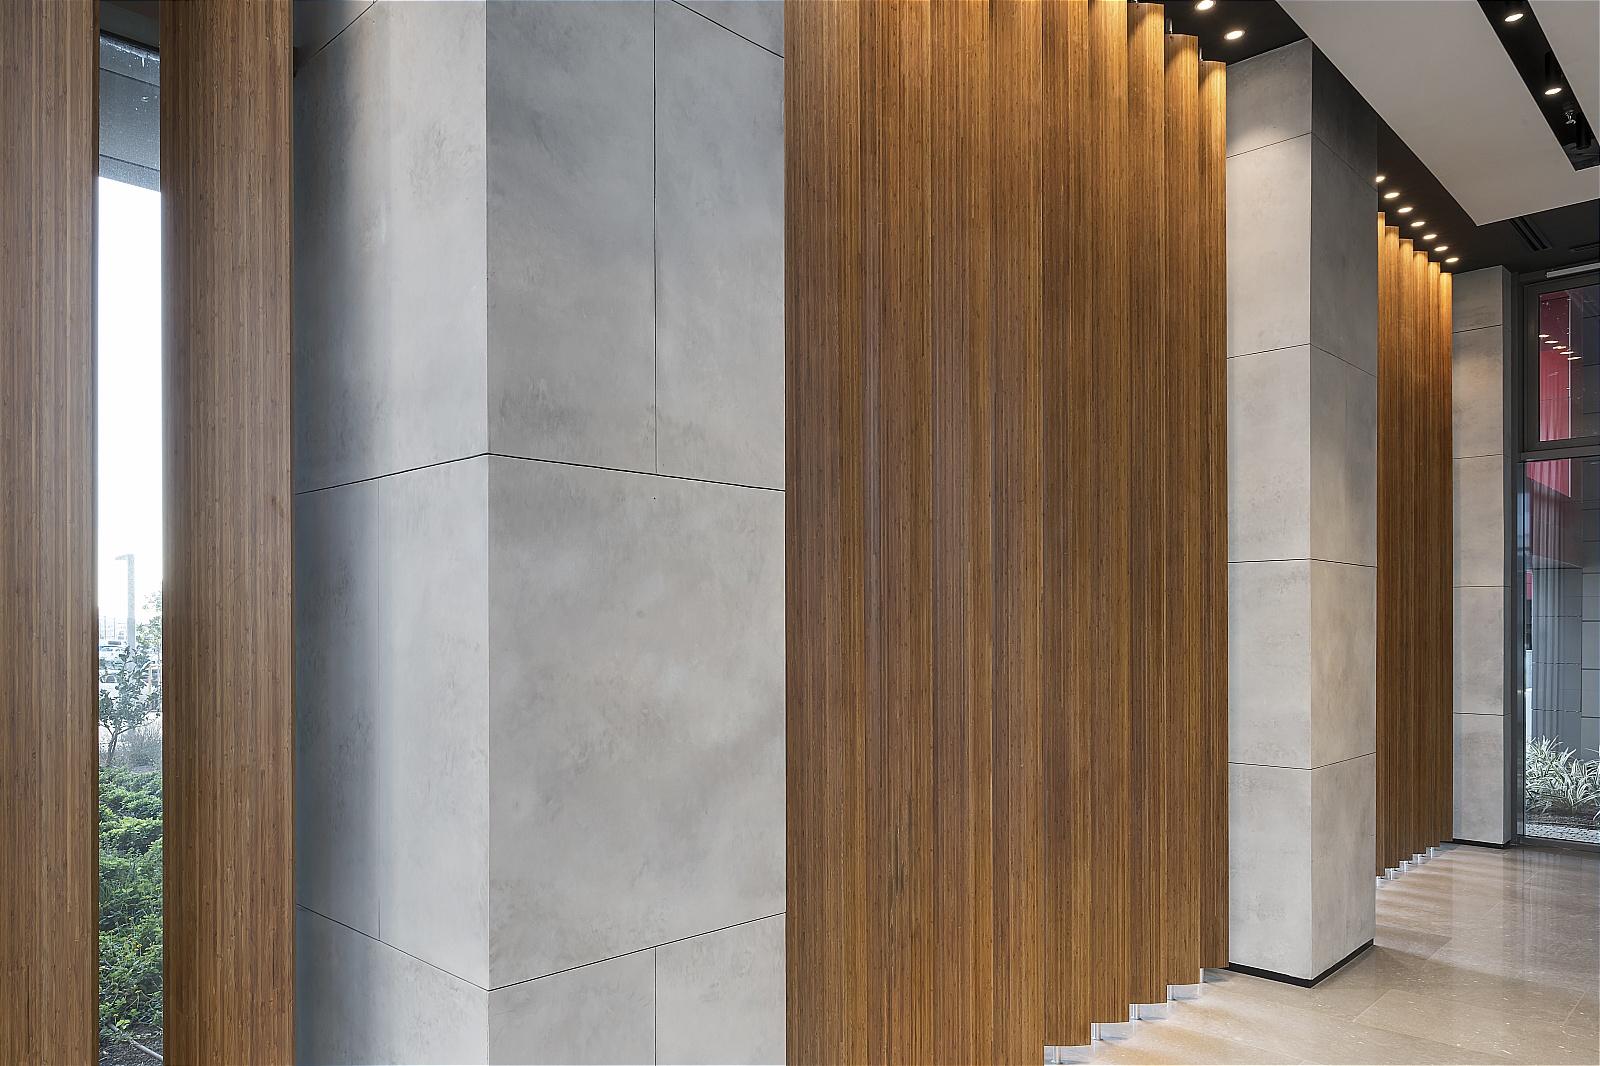 עיצוב בבטון אדריכלי